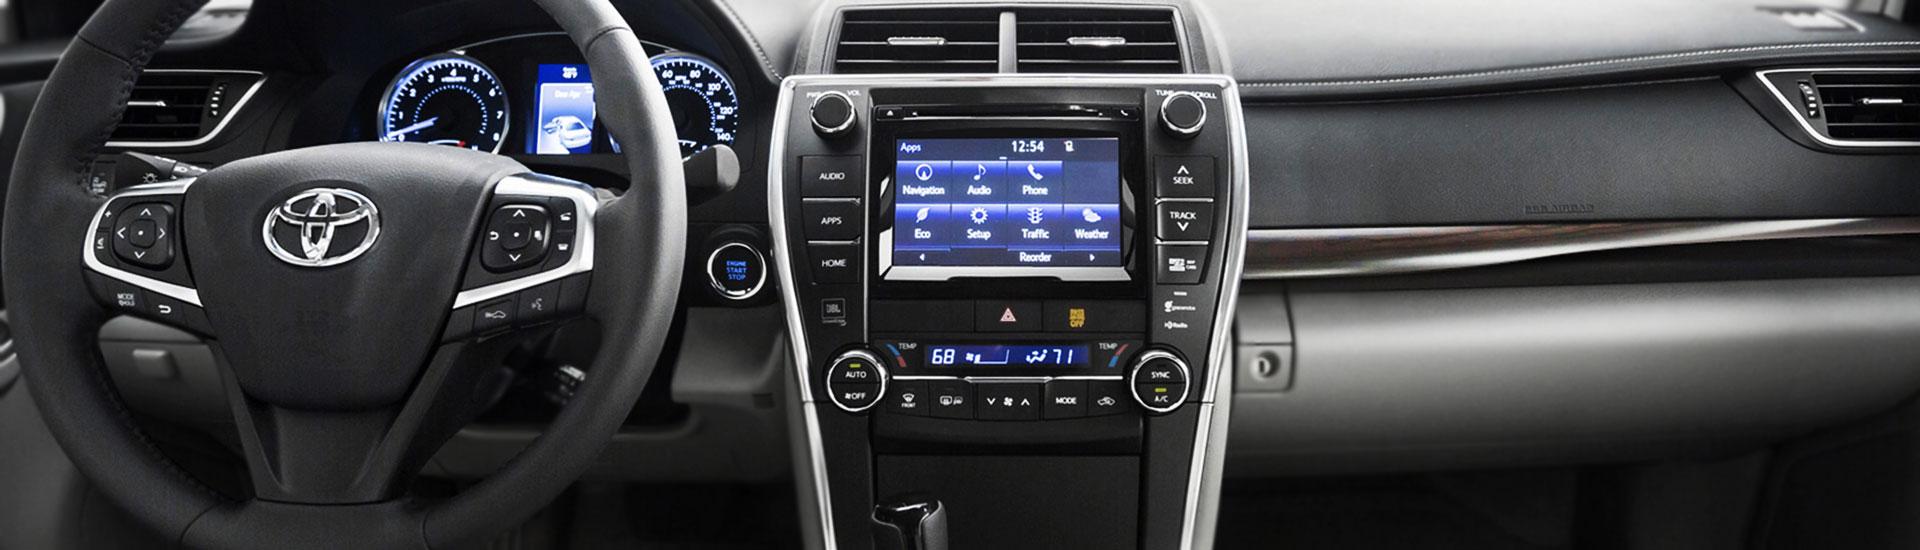 Toyota Camry Custom Dash Kits